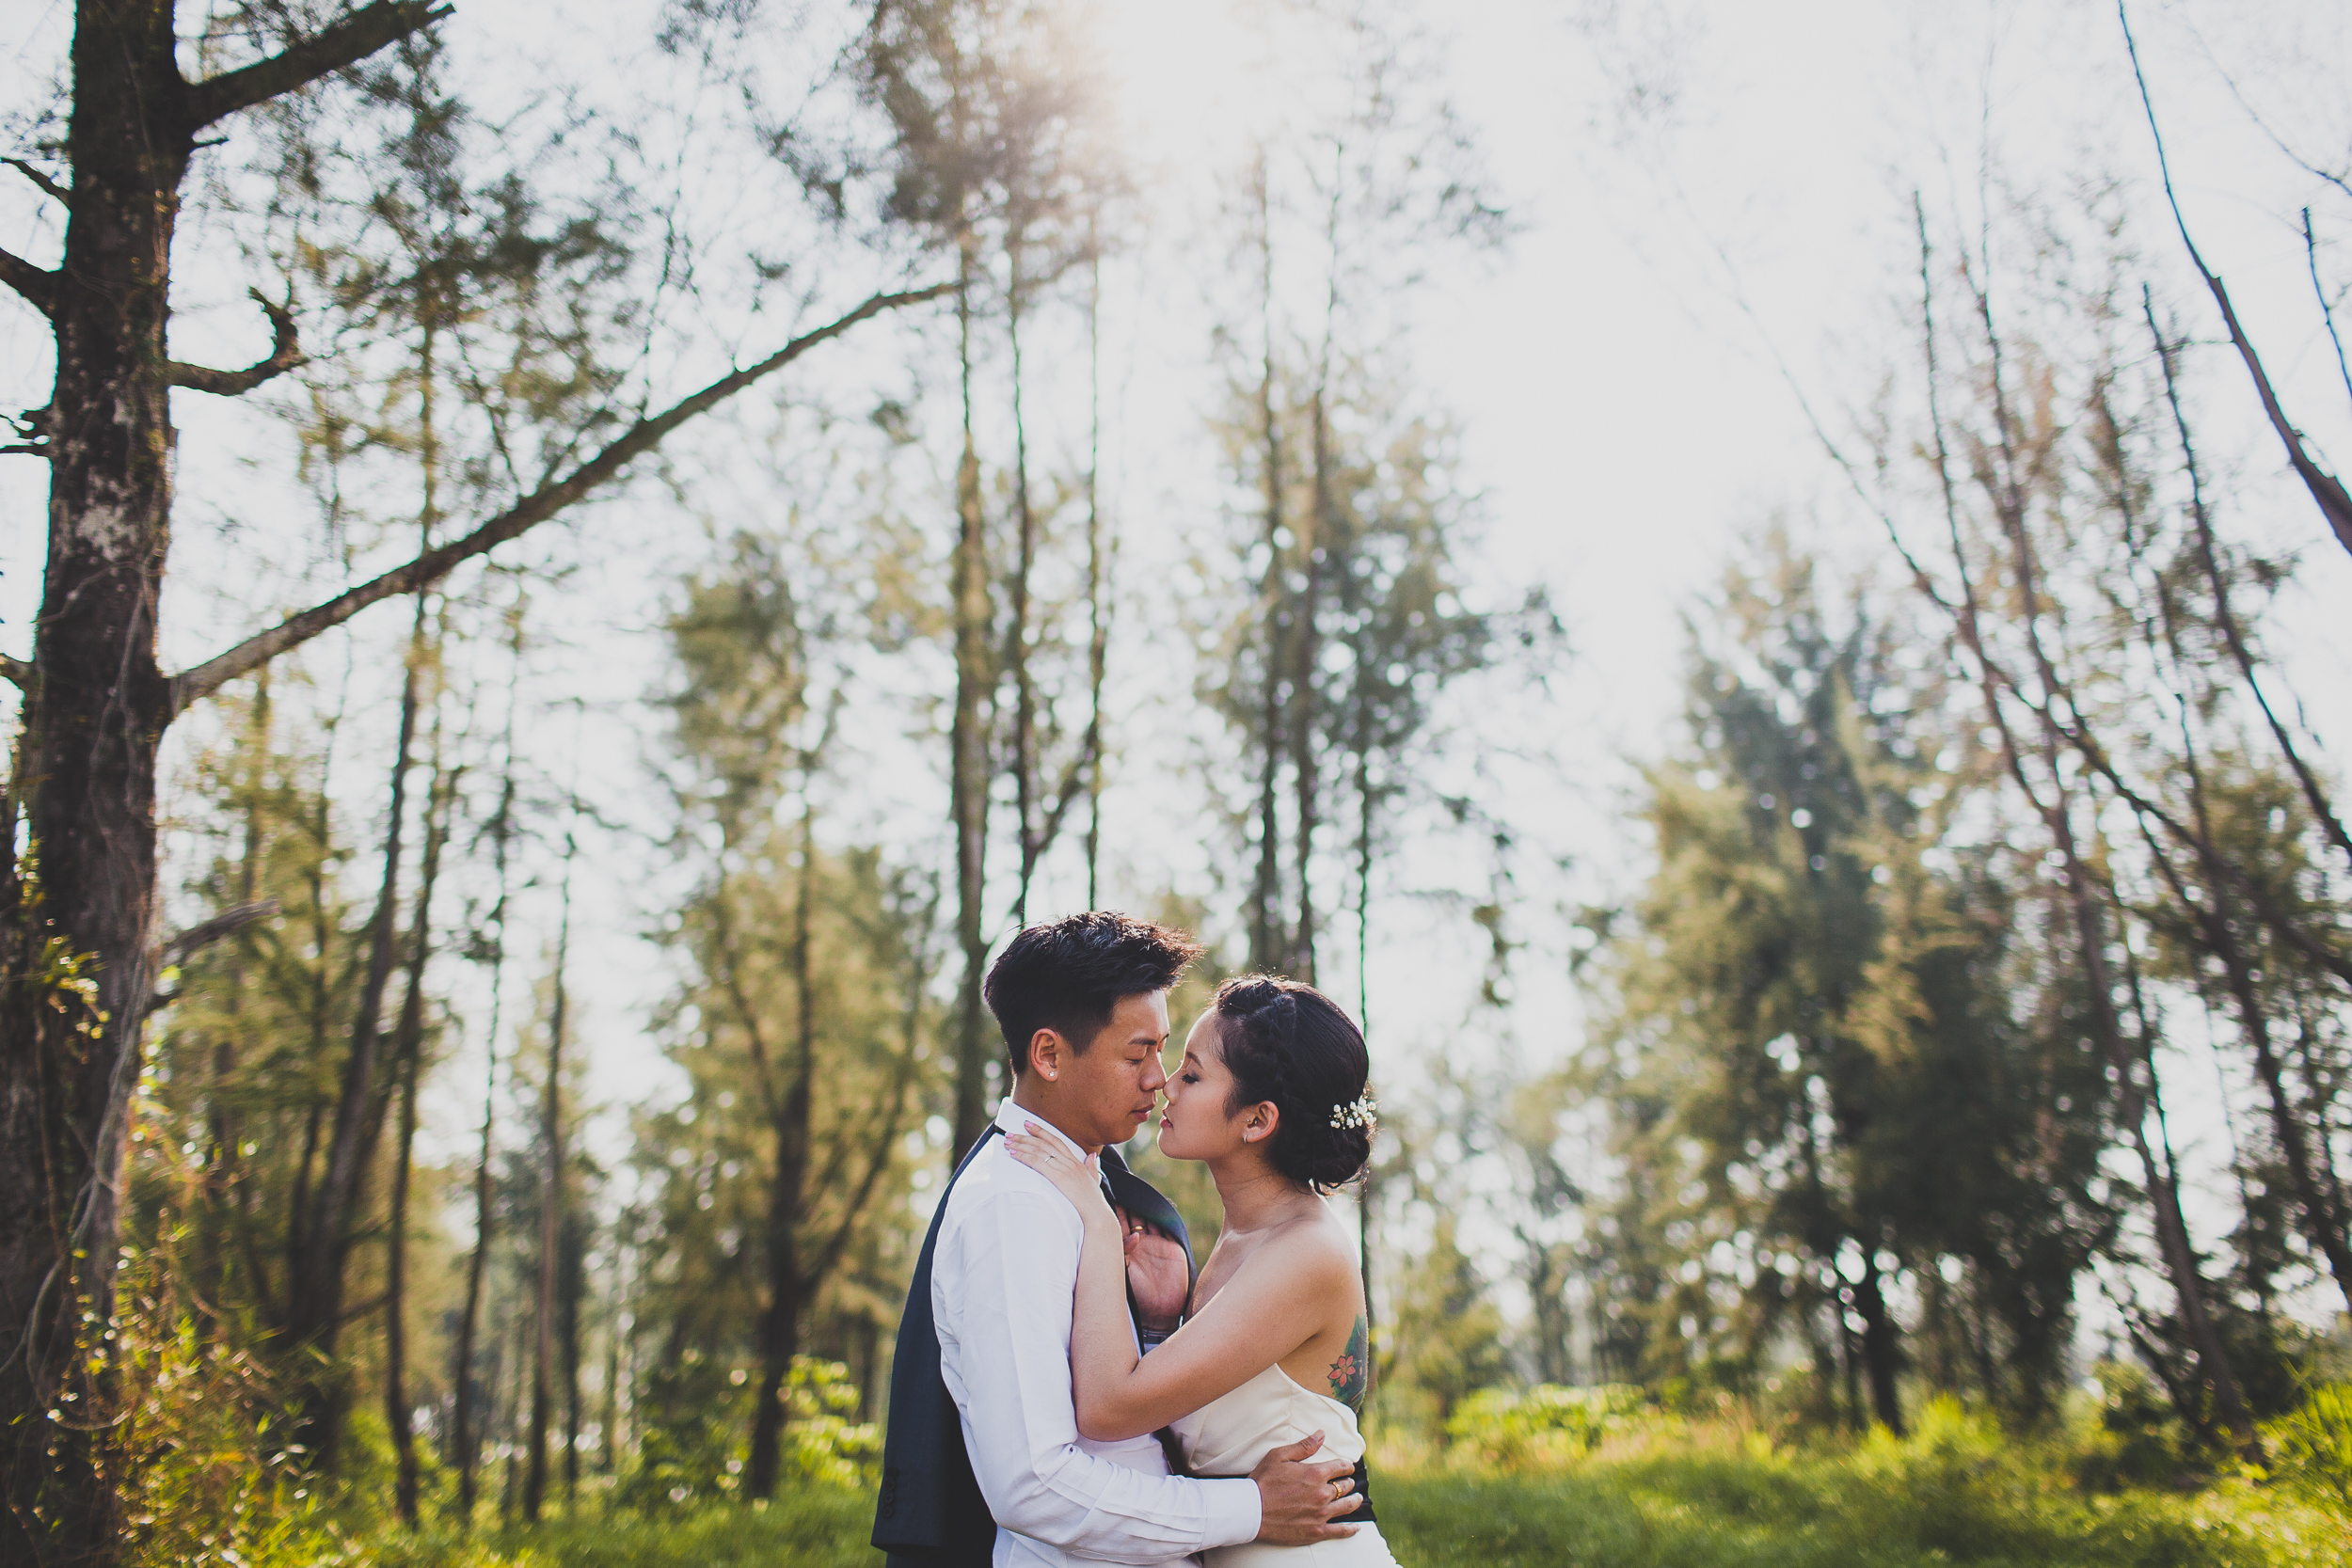 Singapore+Pre+Wedding+Photographer+Ziyang+Clara-0032.jpg